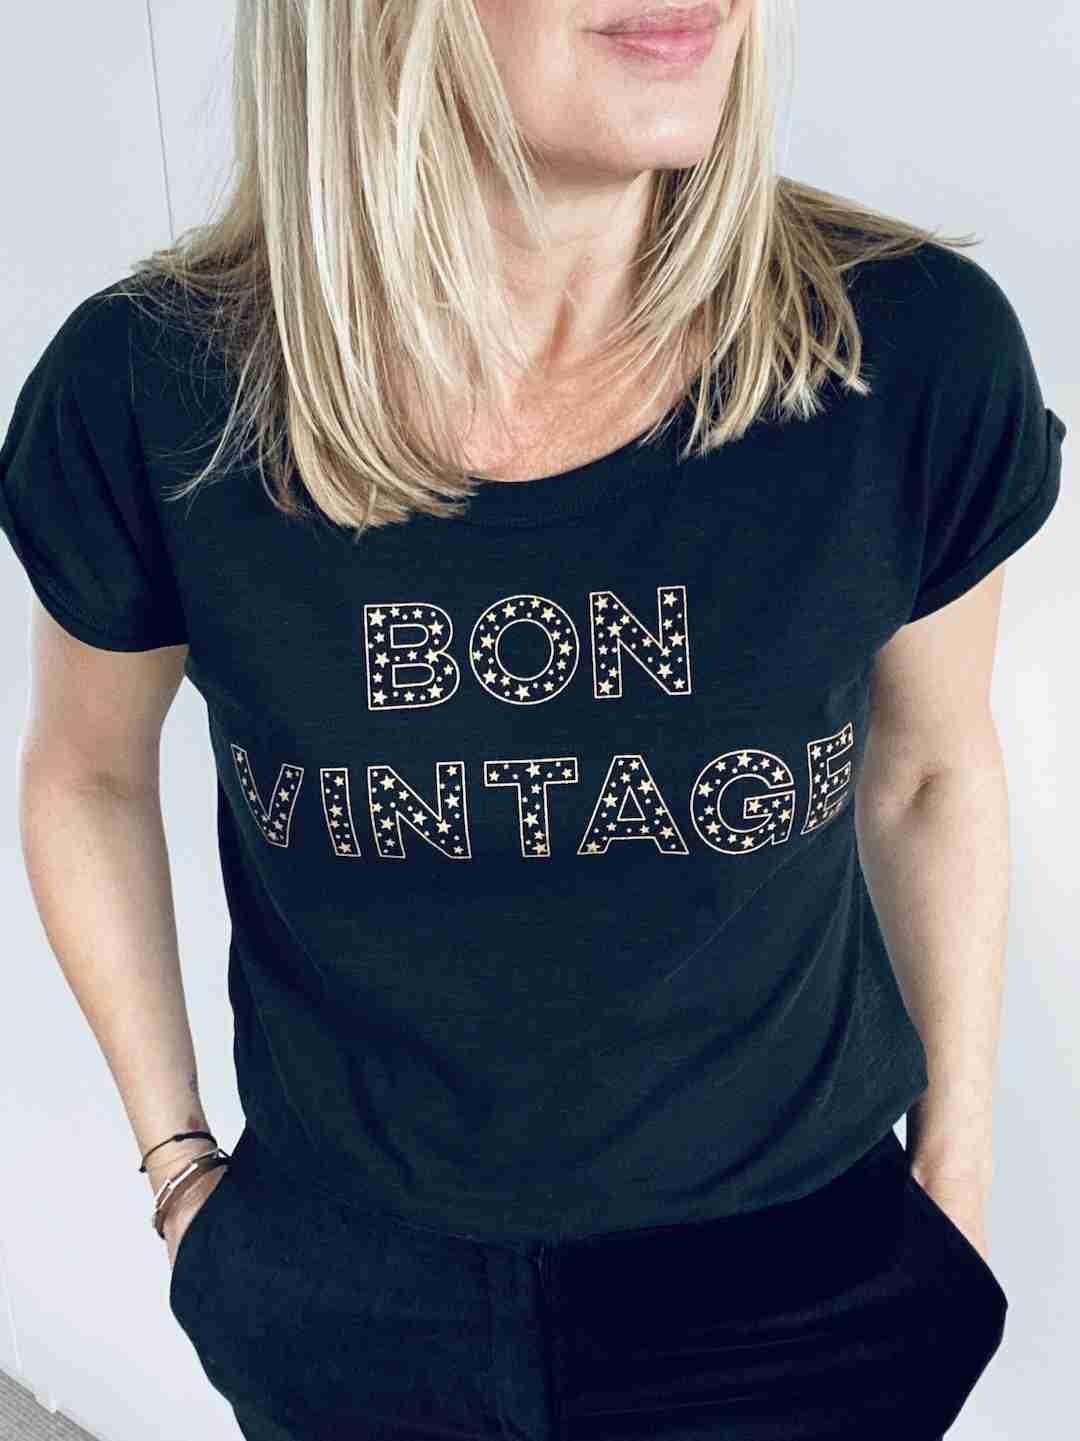 bon vintage stars tee black gold | fwp by rae